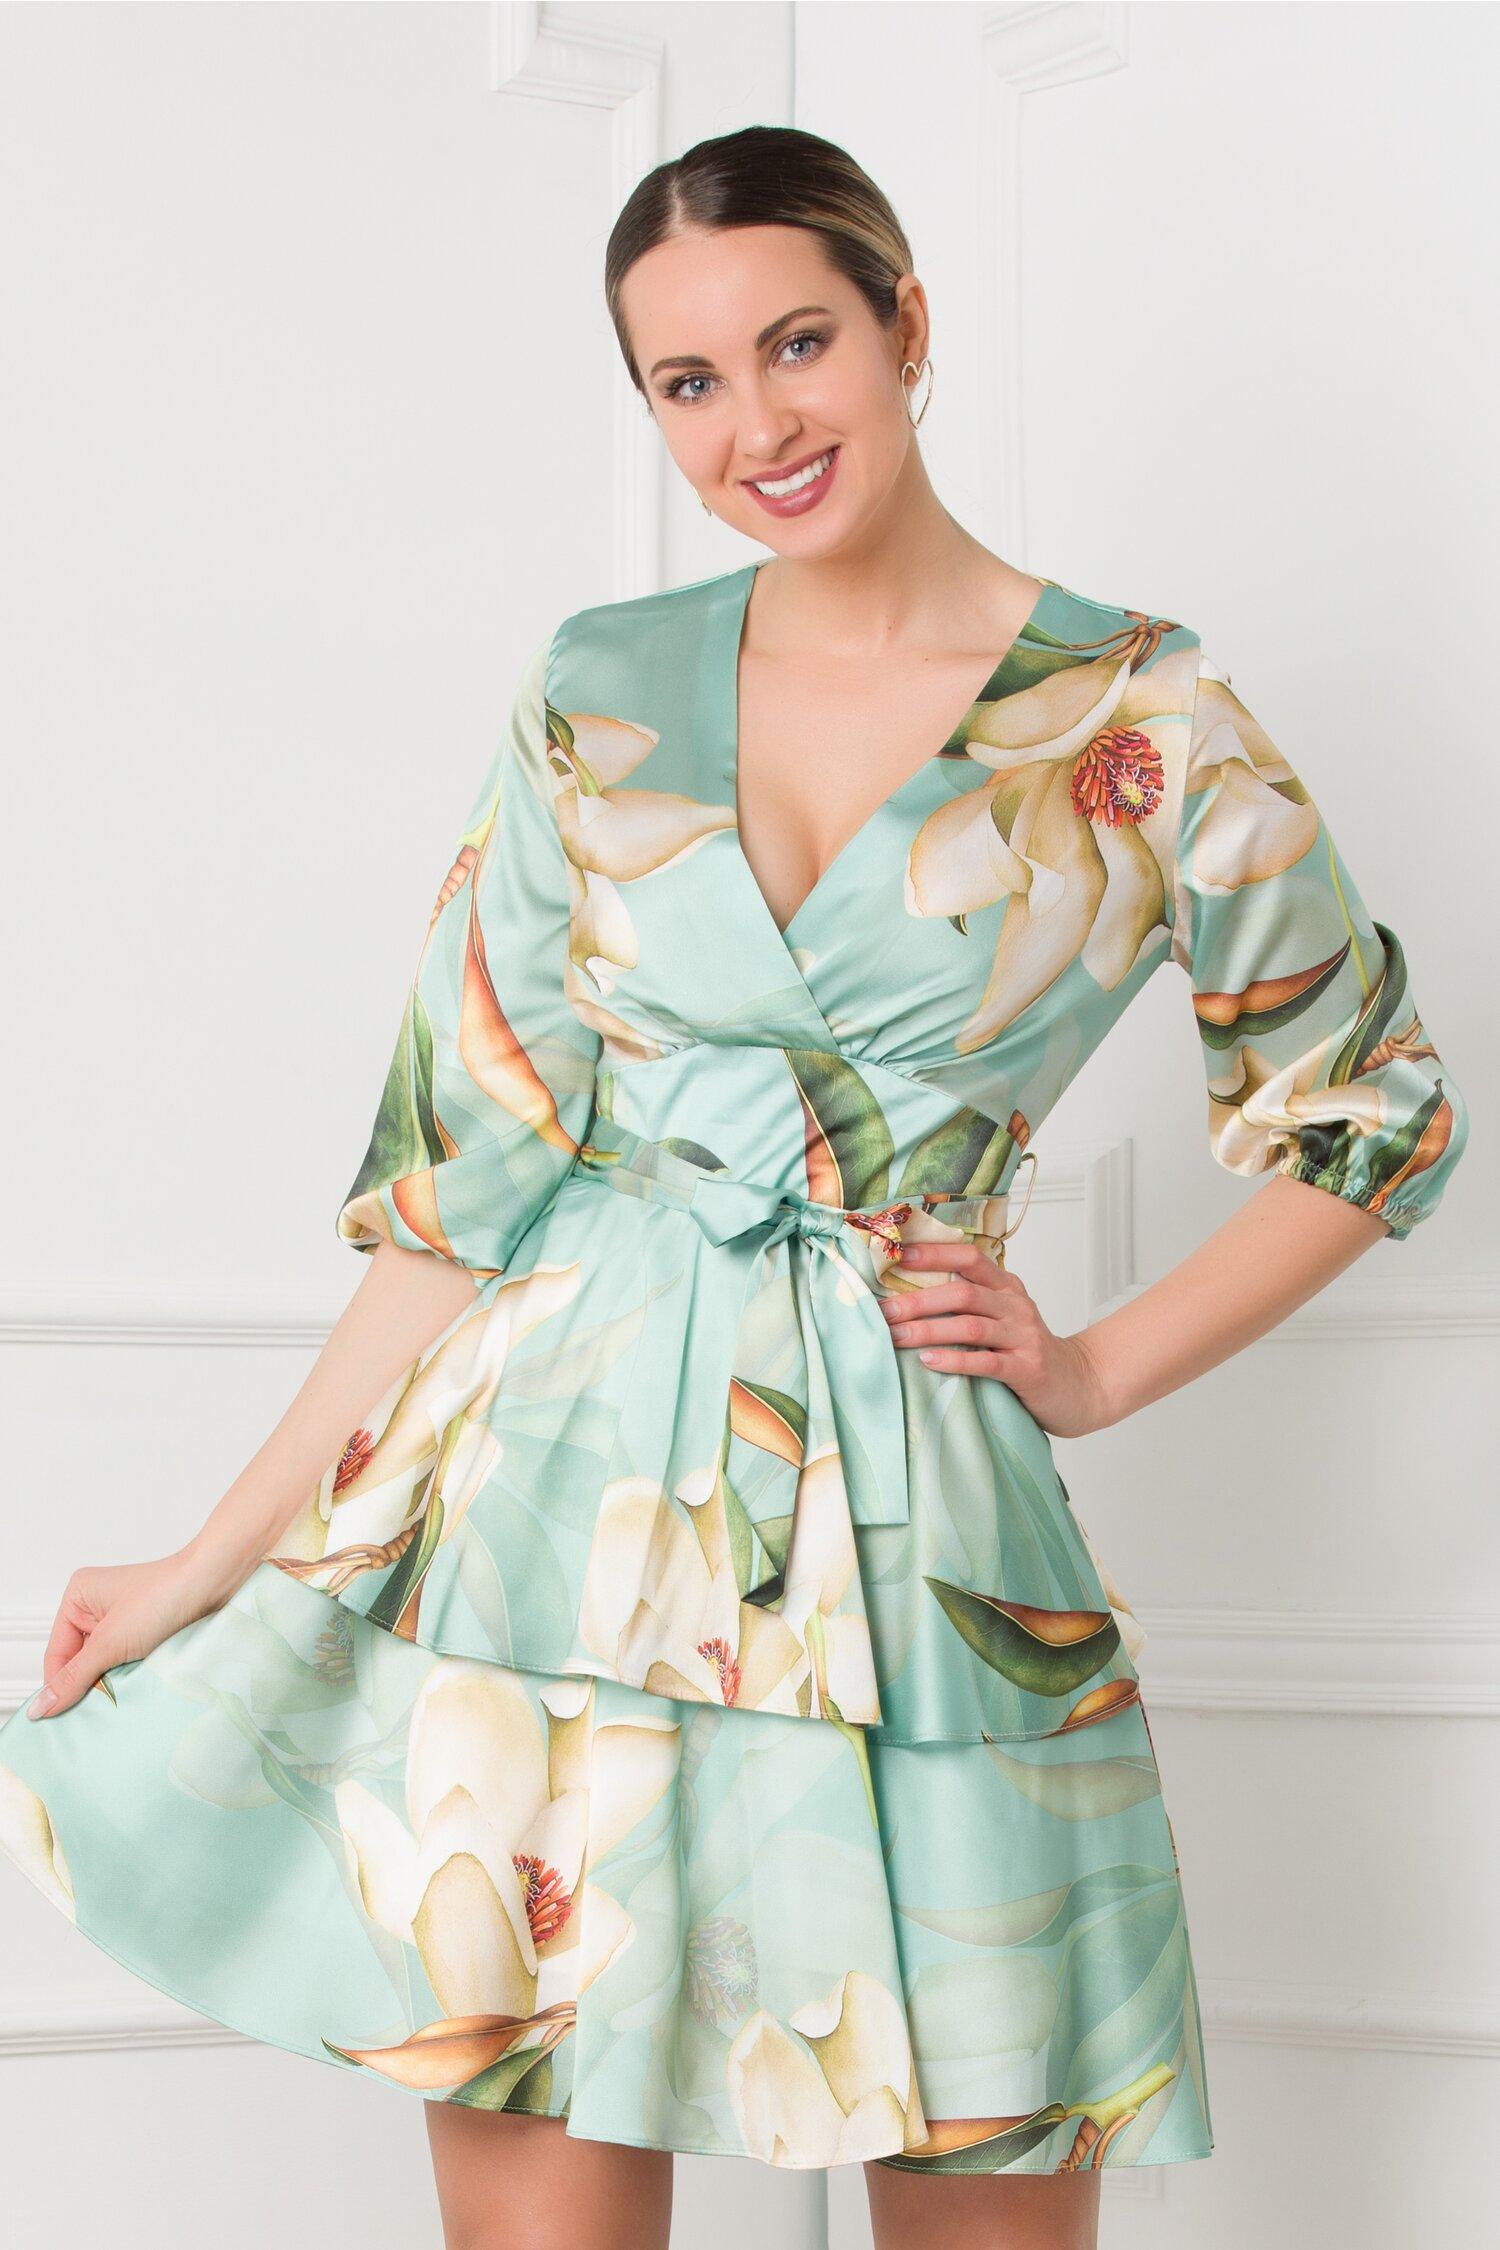 Rochie Maria verde pastel cu imprimeu floral si volanase la baza